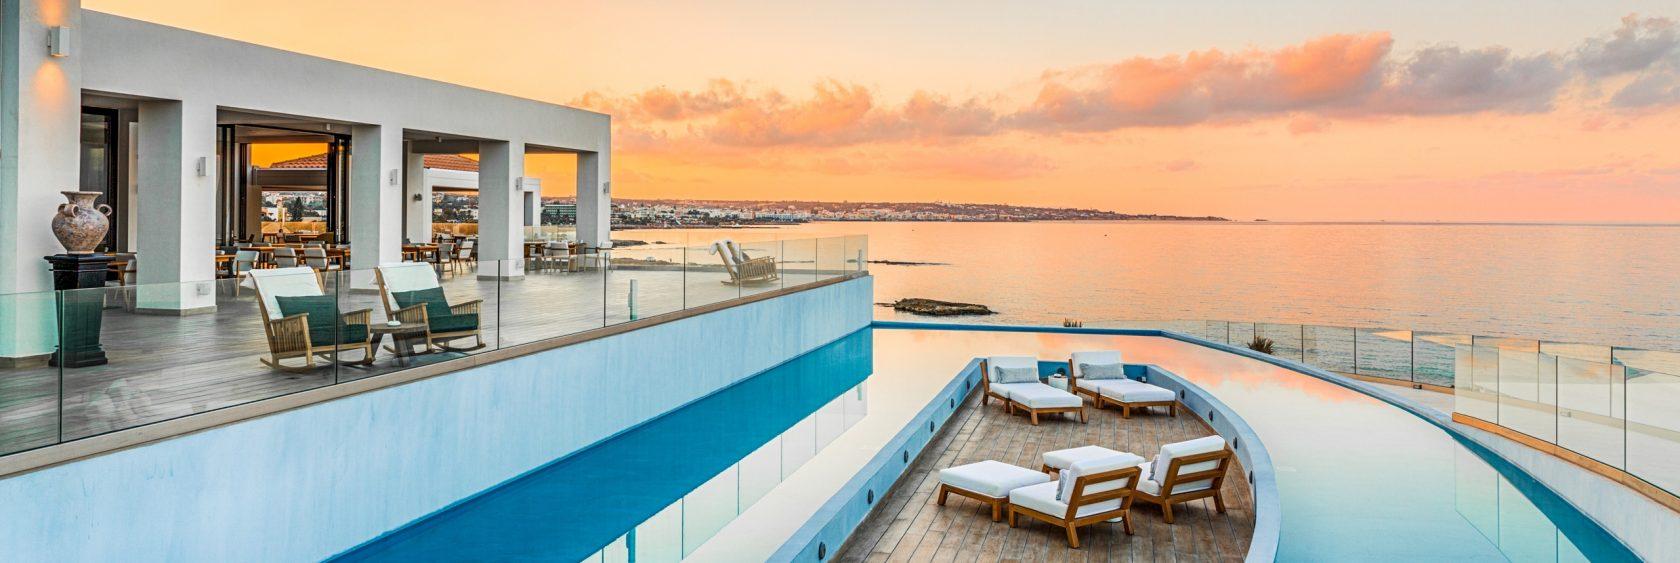 Abaton Island Resort Kreta – Terrasse mit Ausblick